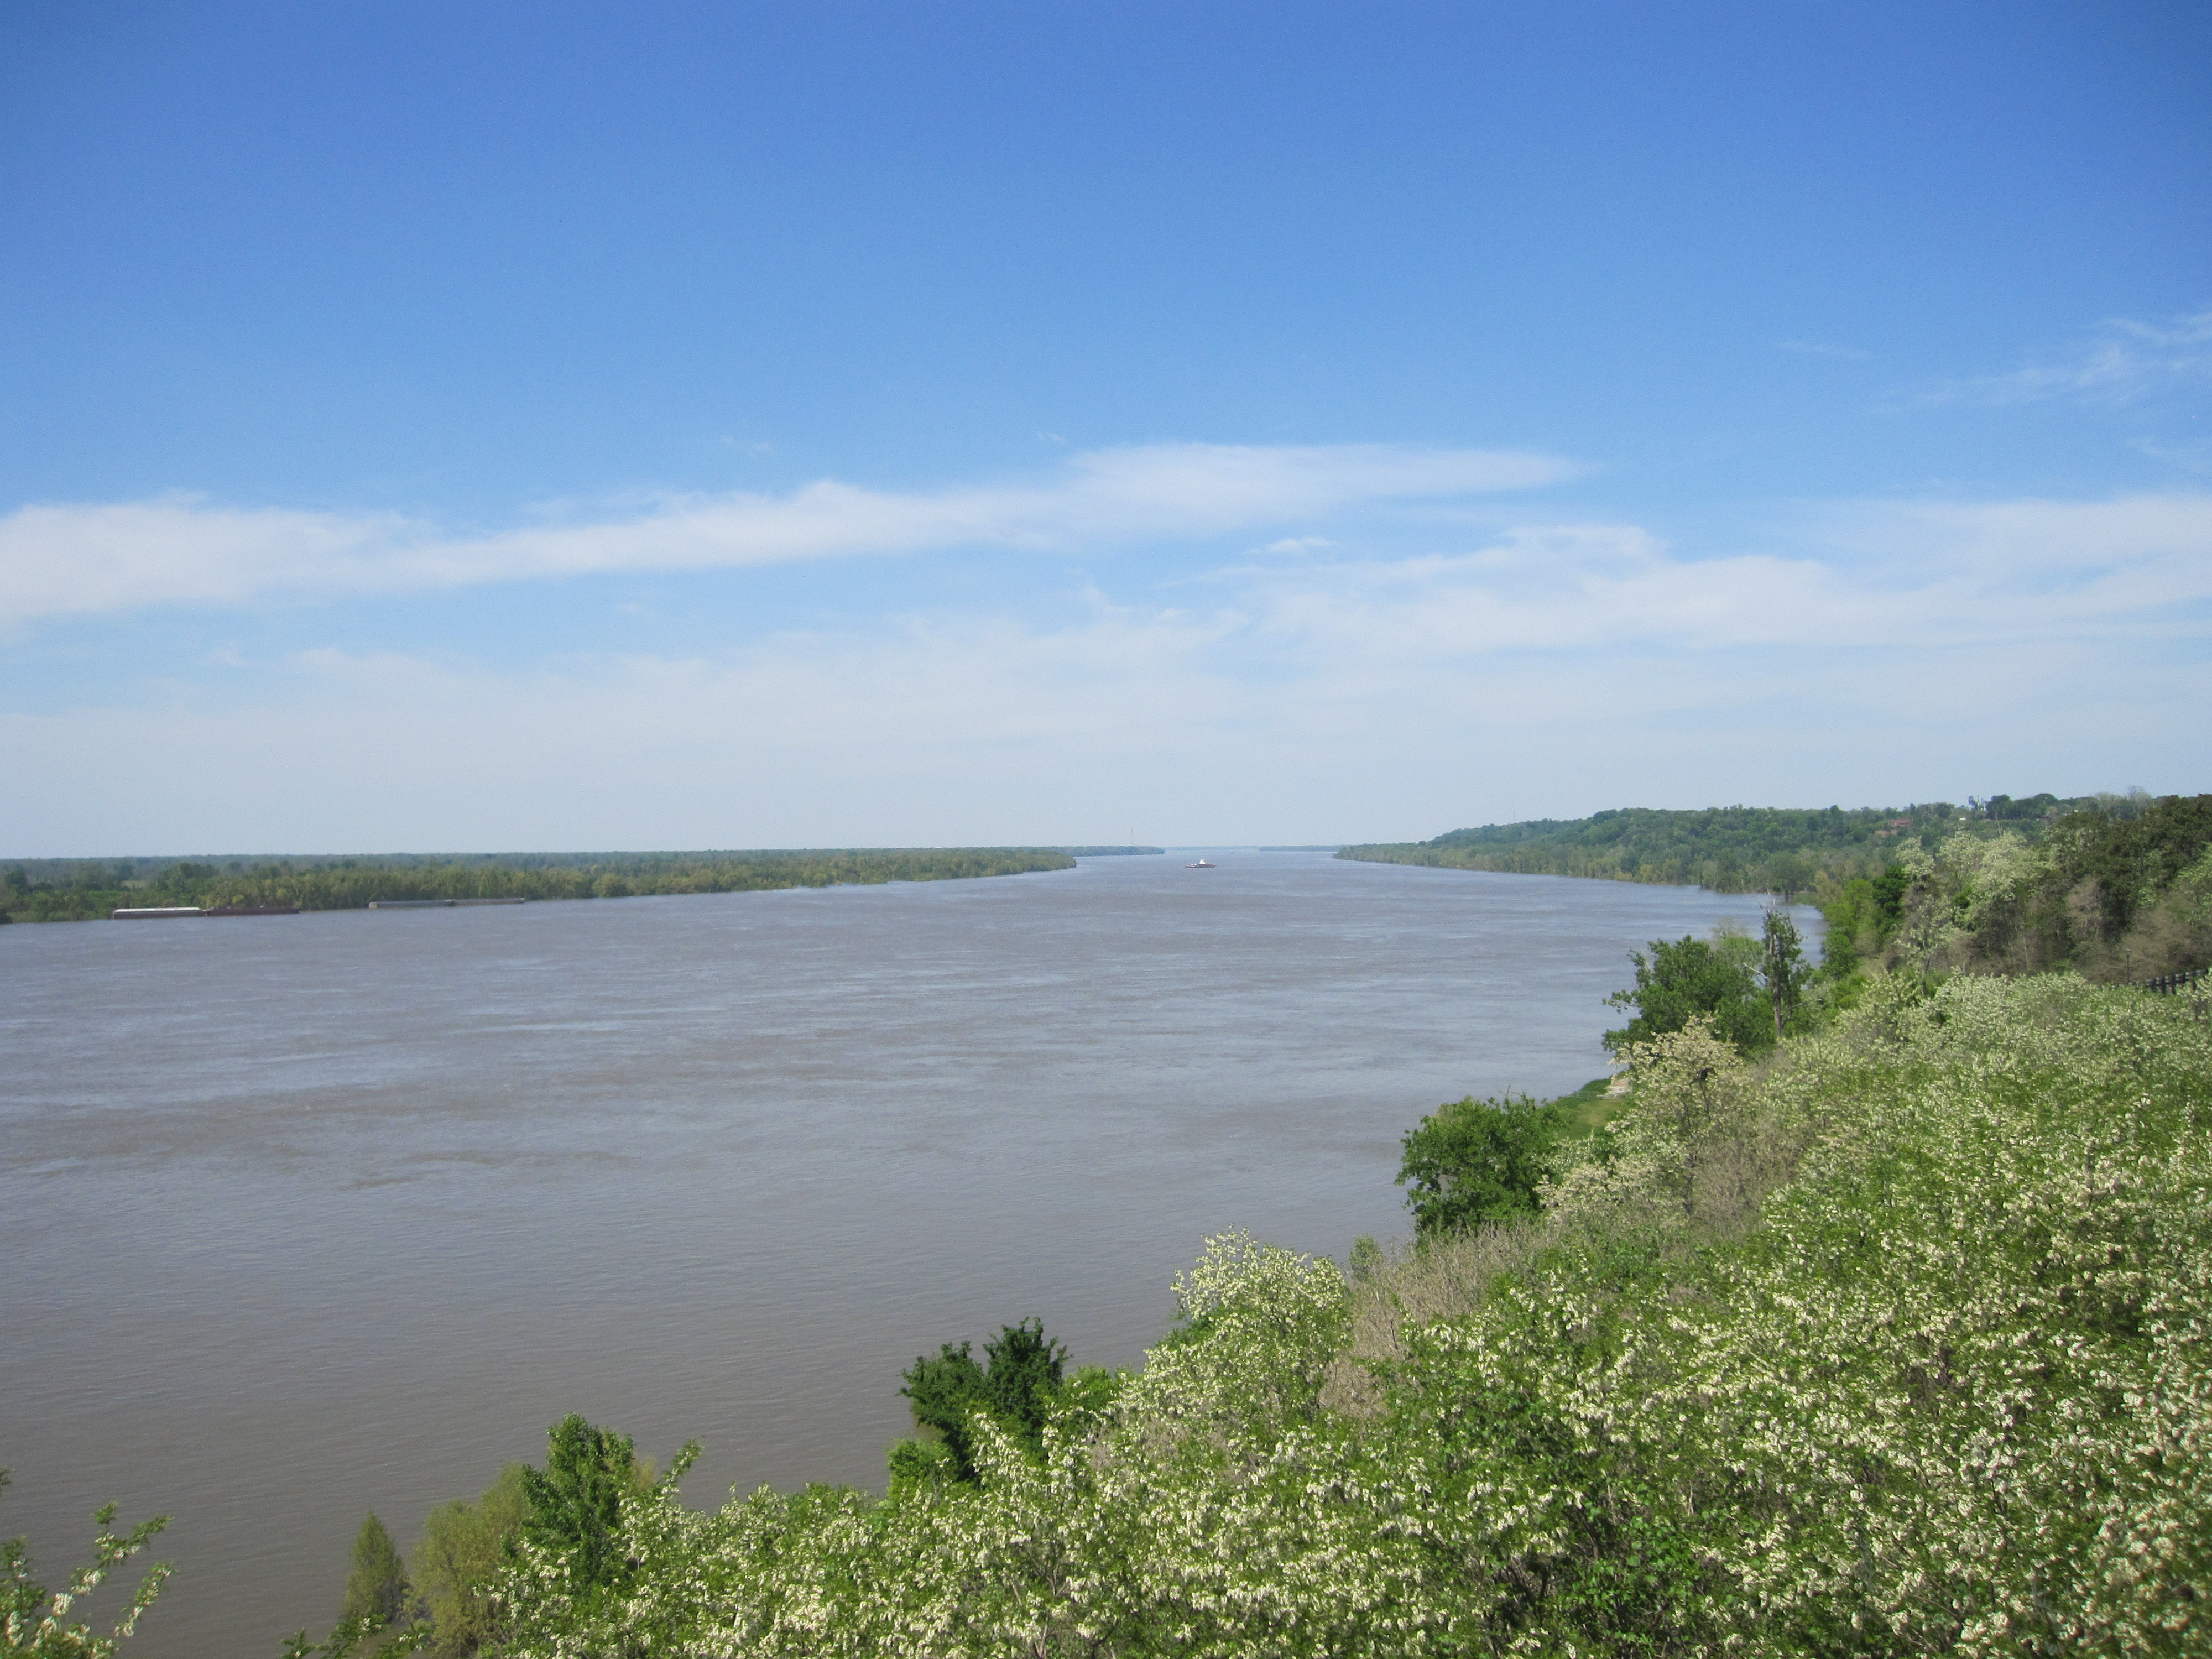 River Mississippi Hd Wallpaper